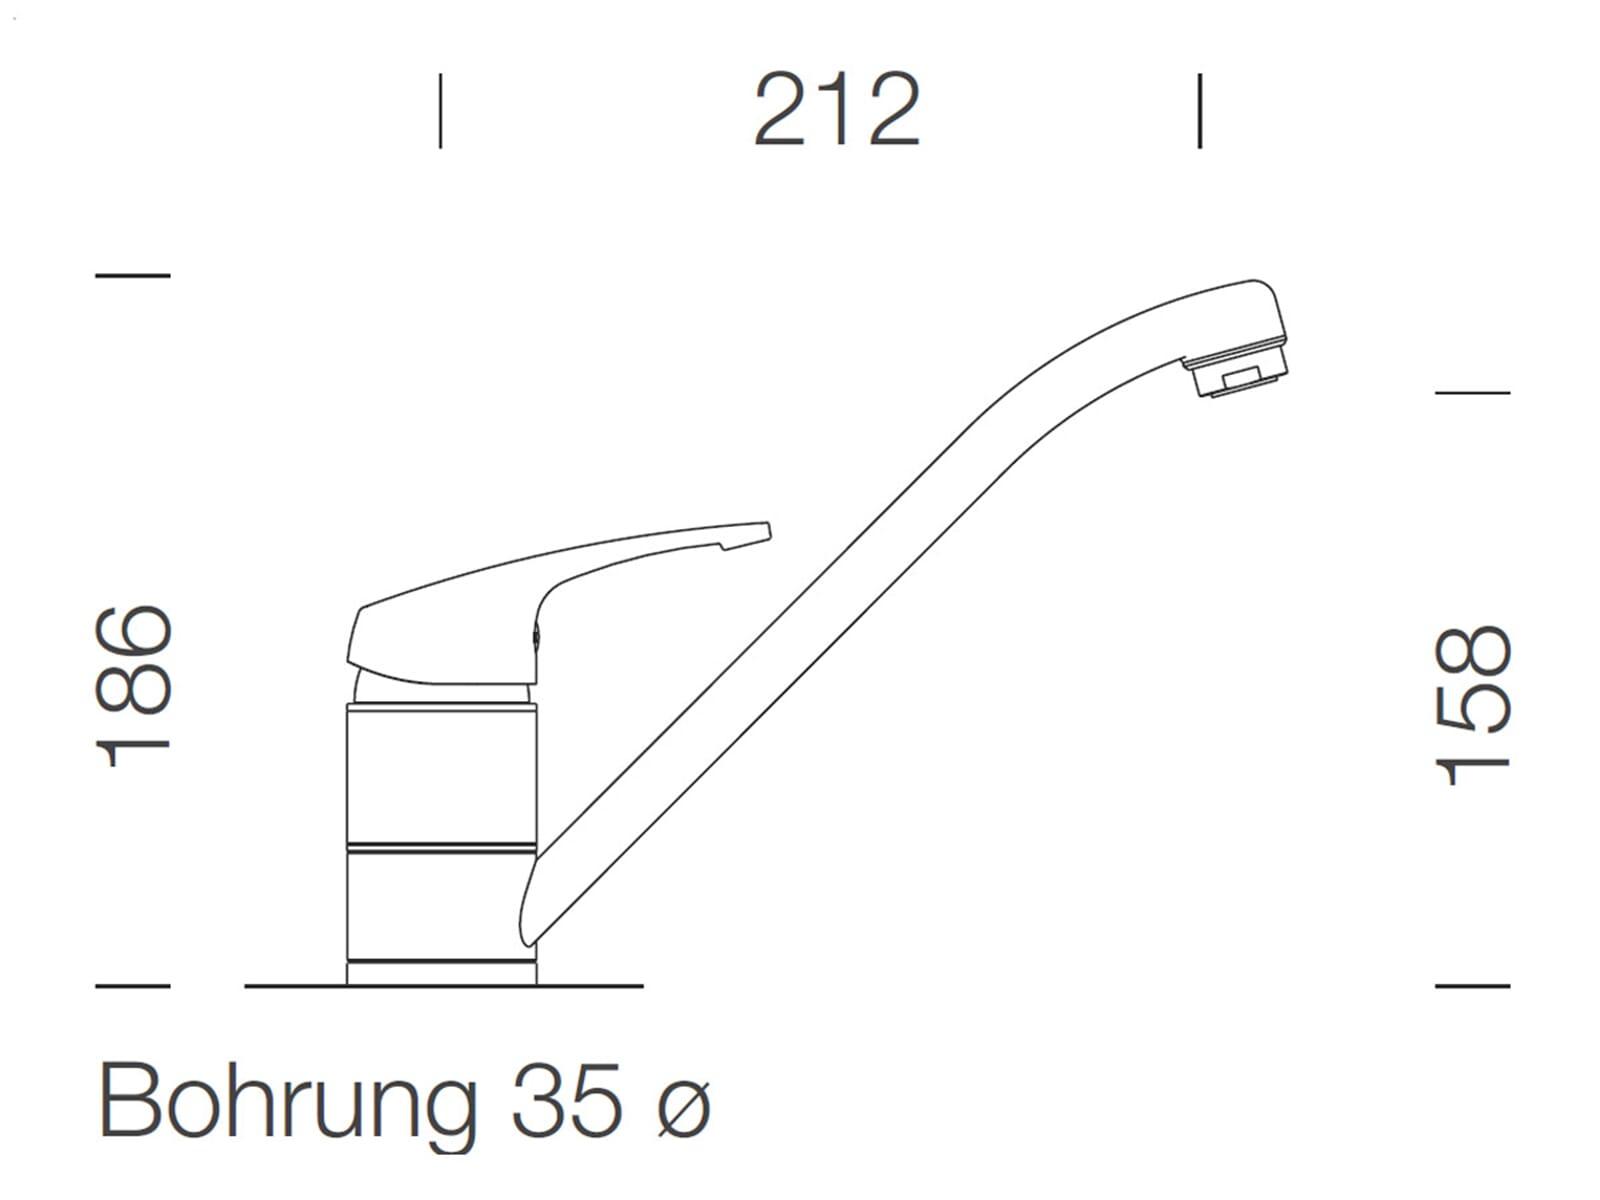 schock tondo r 100 gobi granitsp le sc 40 gobi hochdruck armatur ebay. Black Bedroom Furniture Sets. Home Design Ideas